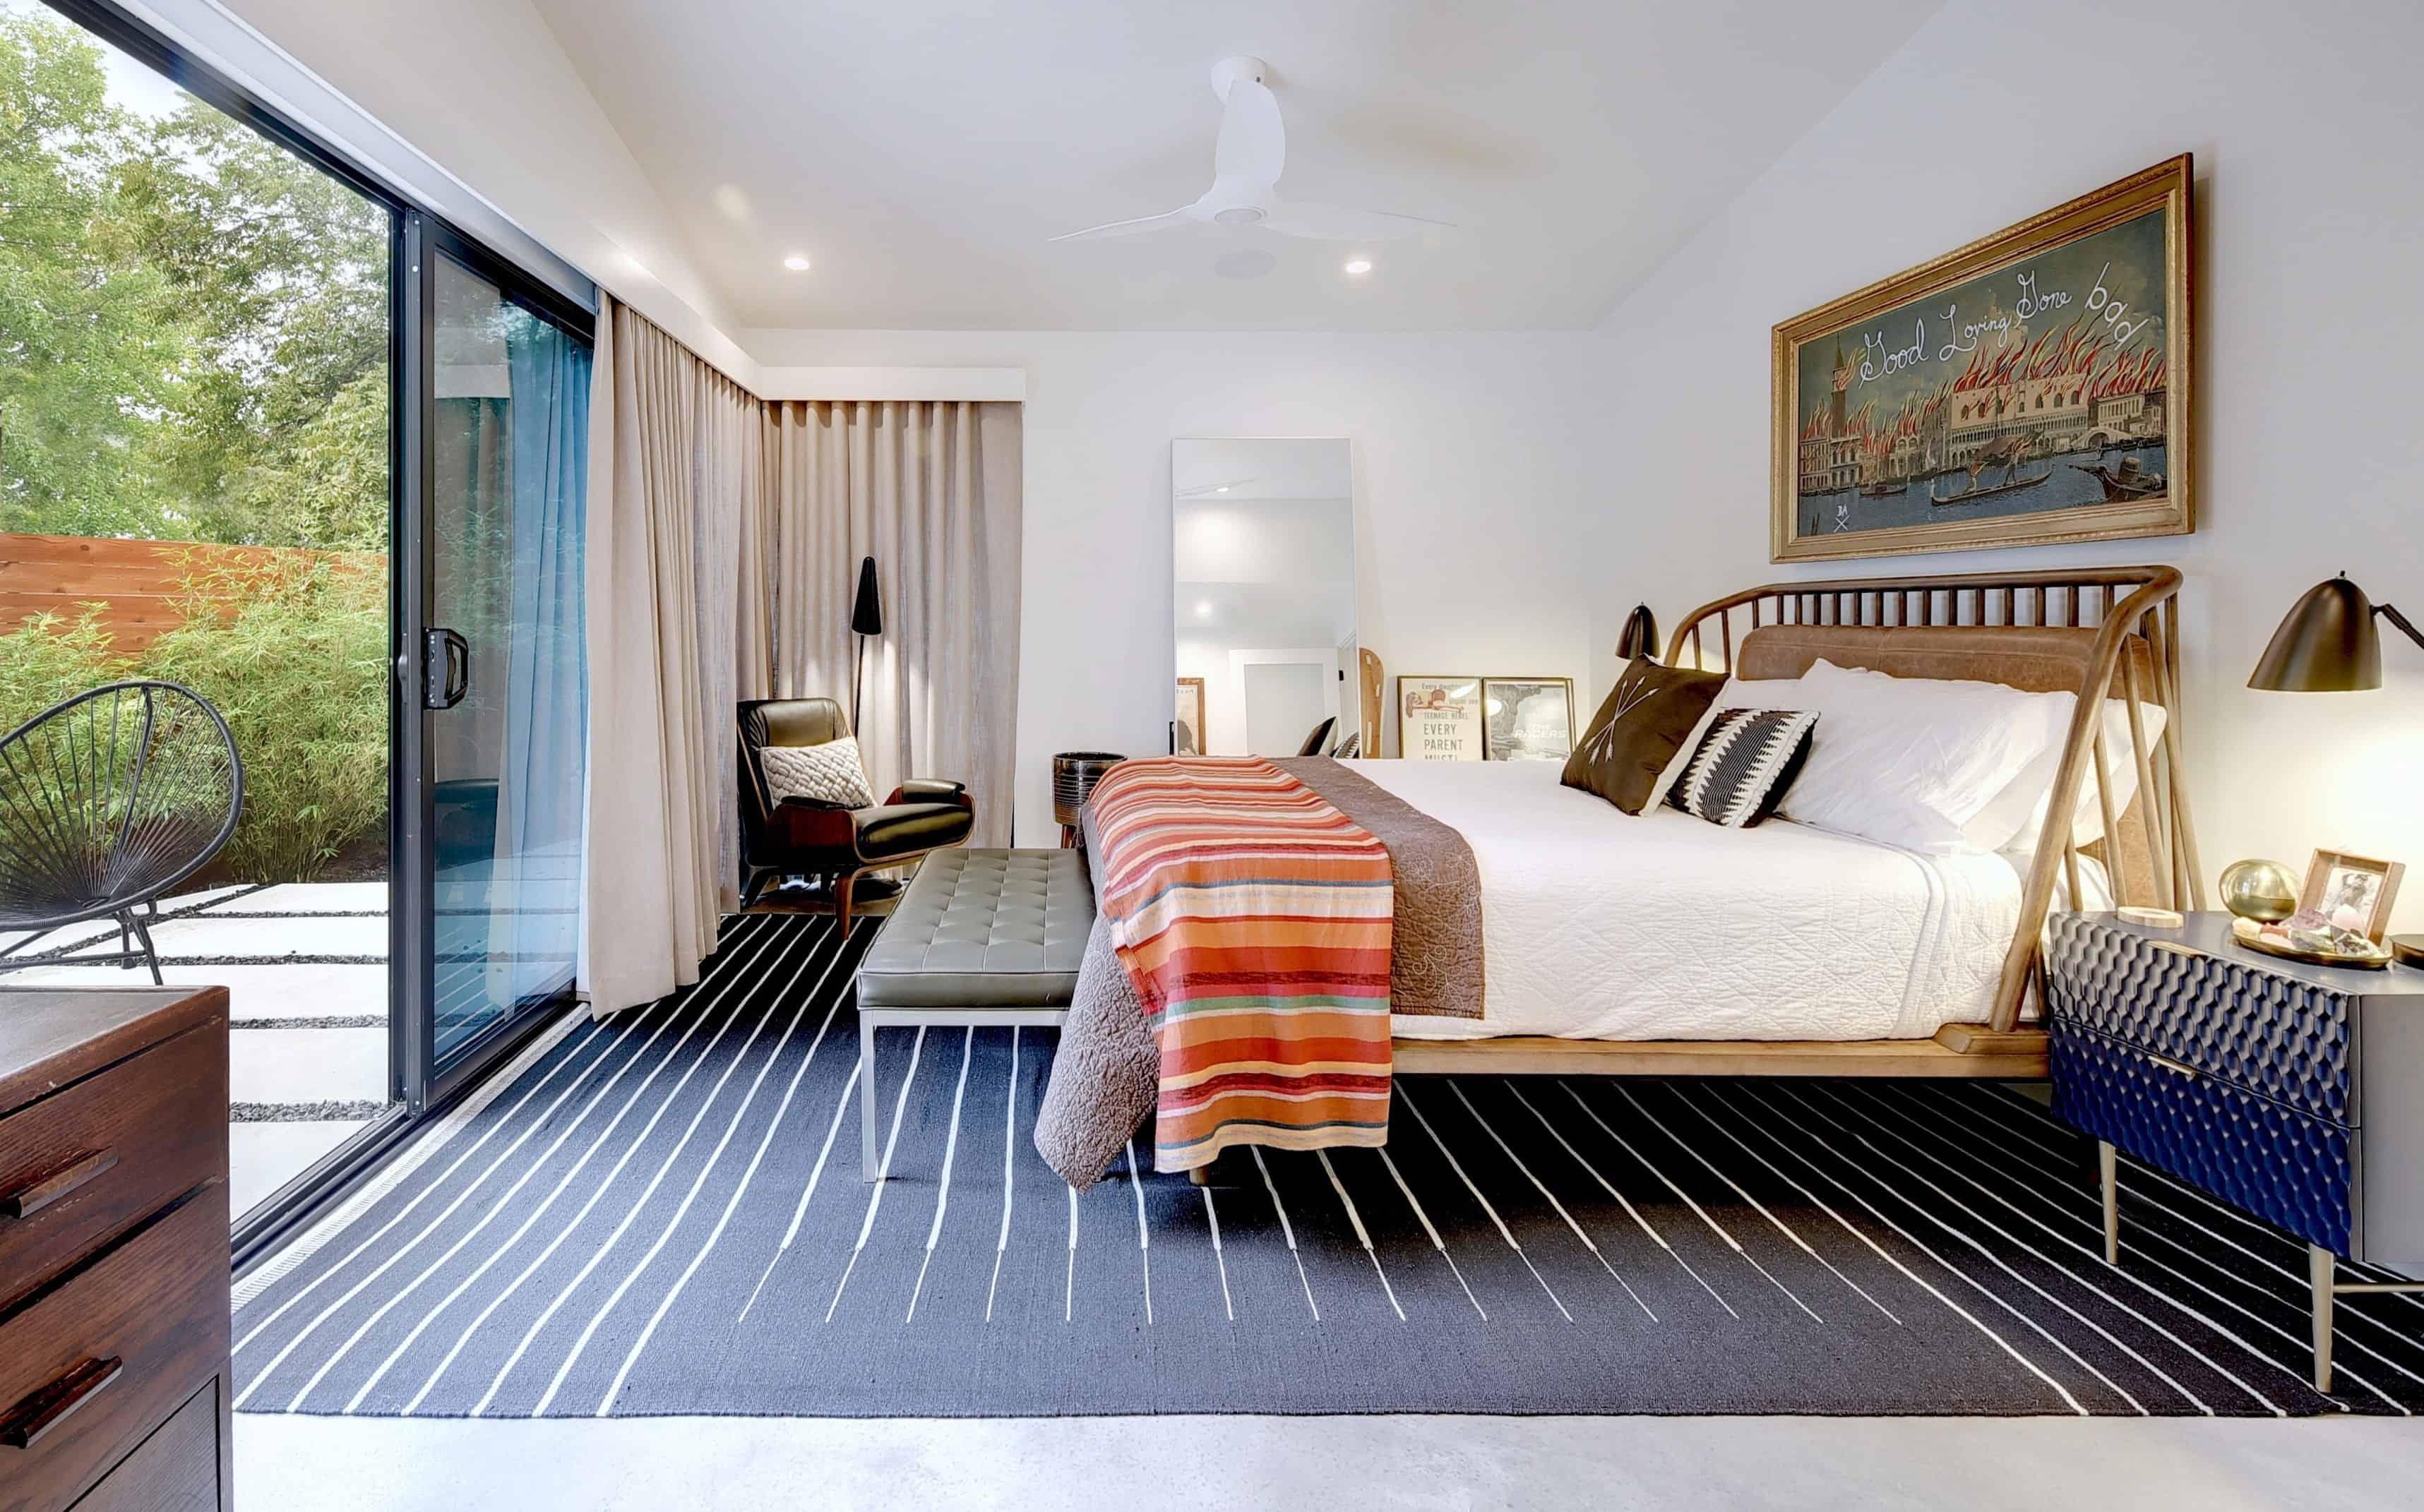 Bedroom in the Re-Open House designed by Matt Fajkus Architecture.